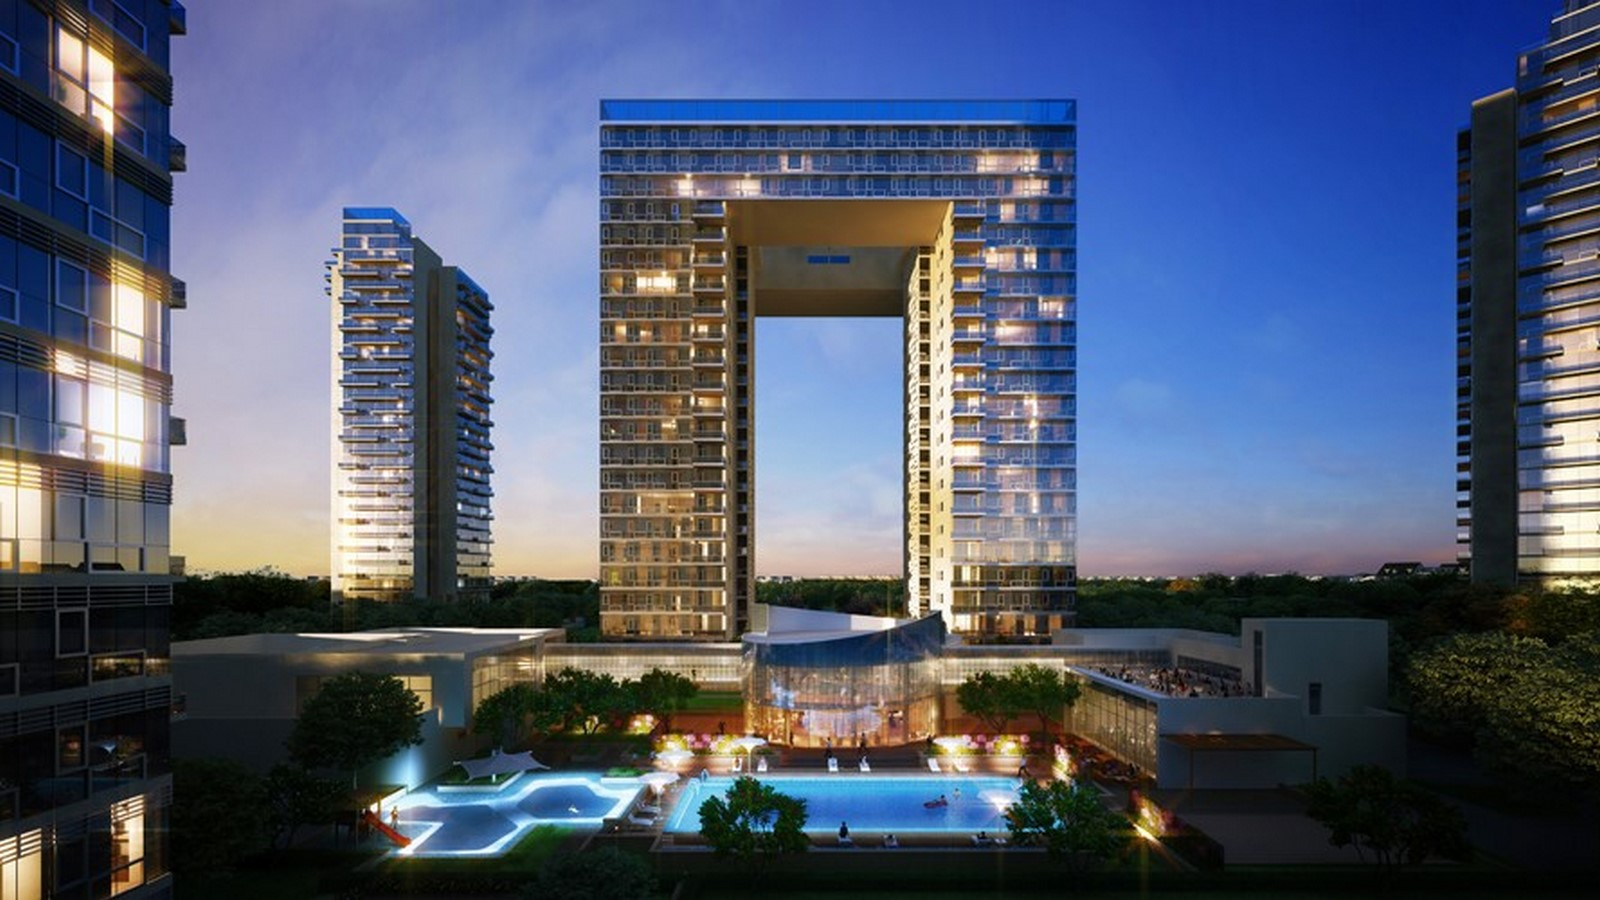 Sorg Architects- 10 Iconic Sustainable Projects - Sheet1